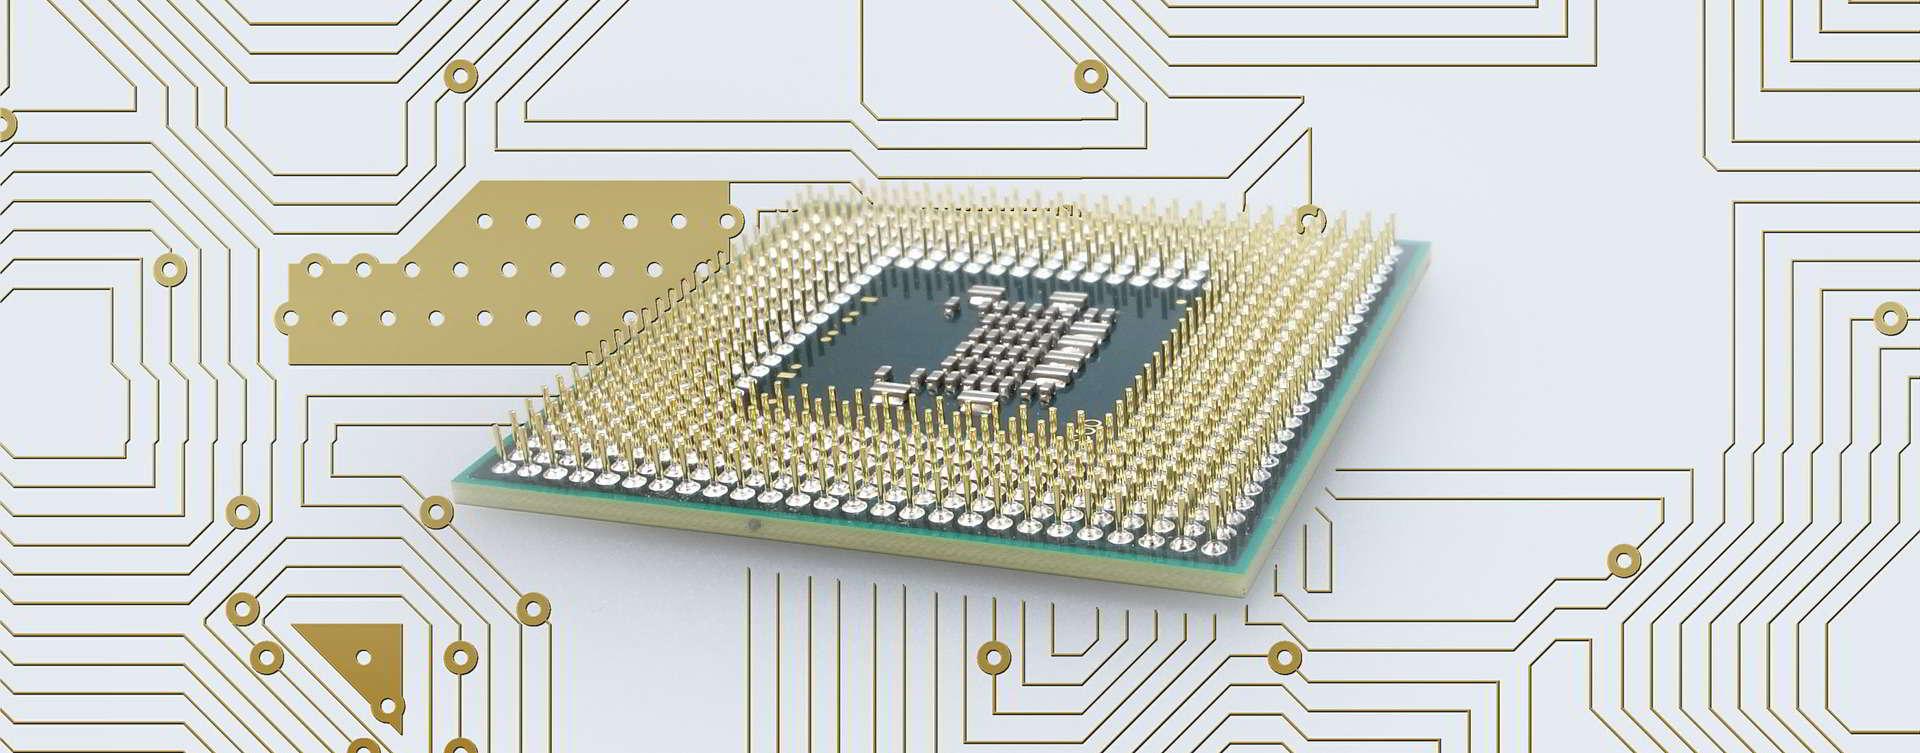 processor-540251_1920